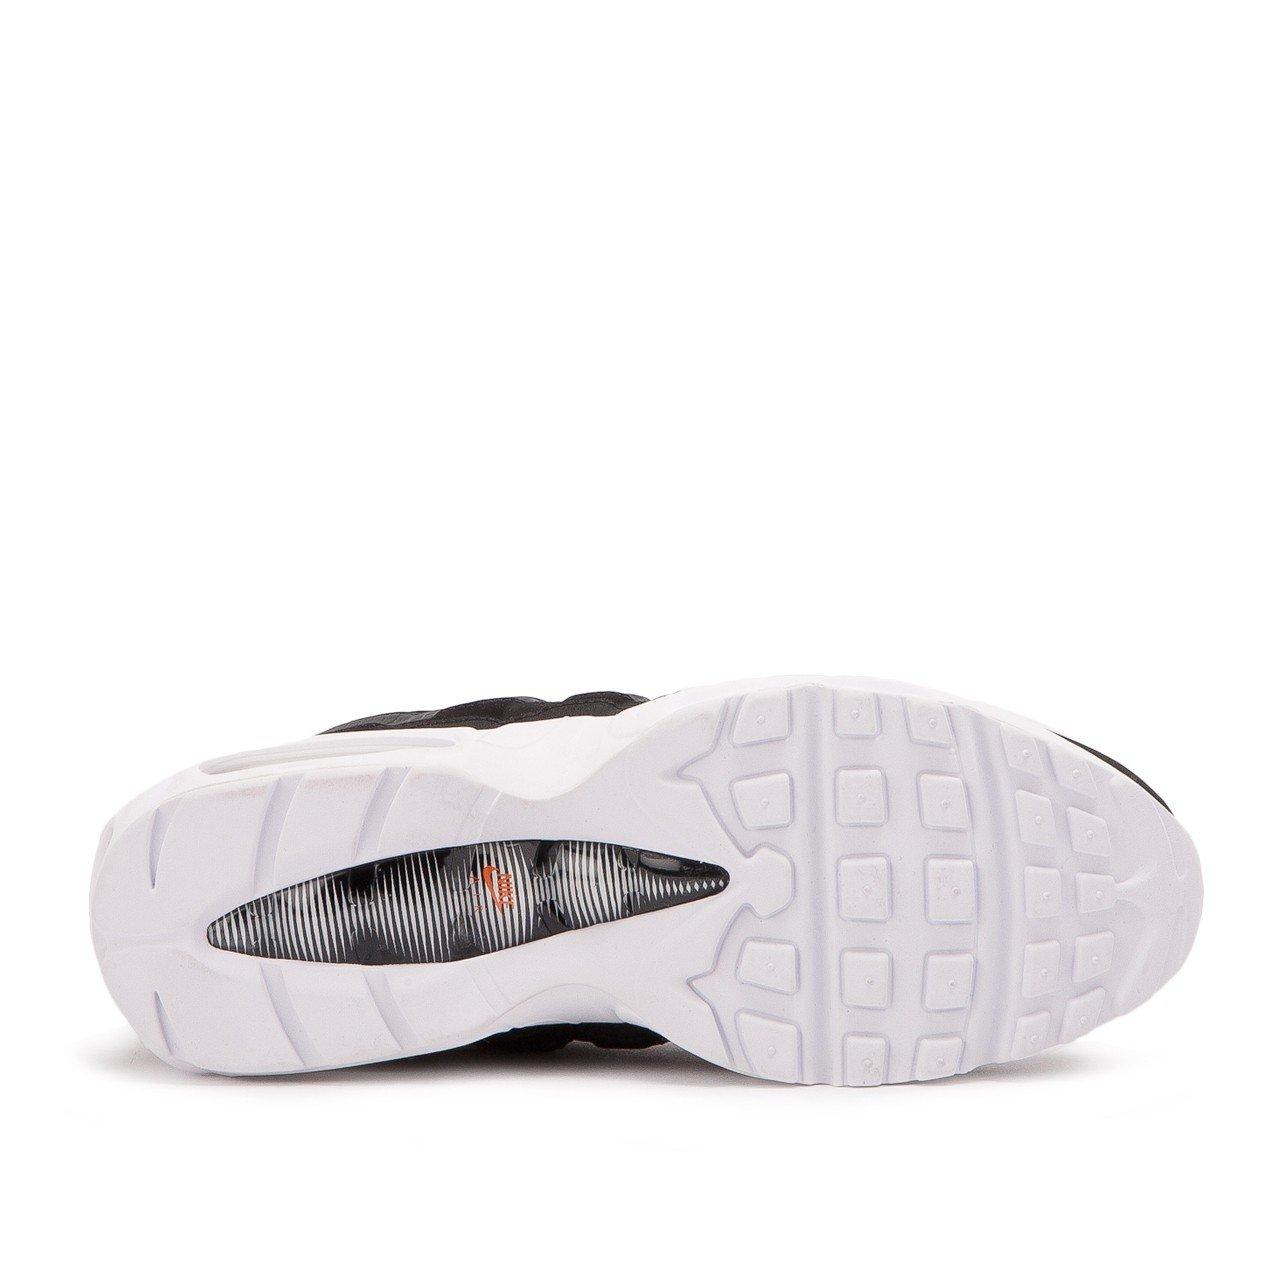 Nike Air Max 95 Premium SE Men Dusty Peach White 924478-200 (11.5) by Nike (Image #6)